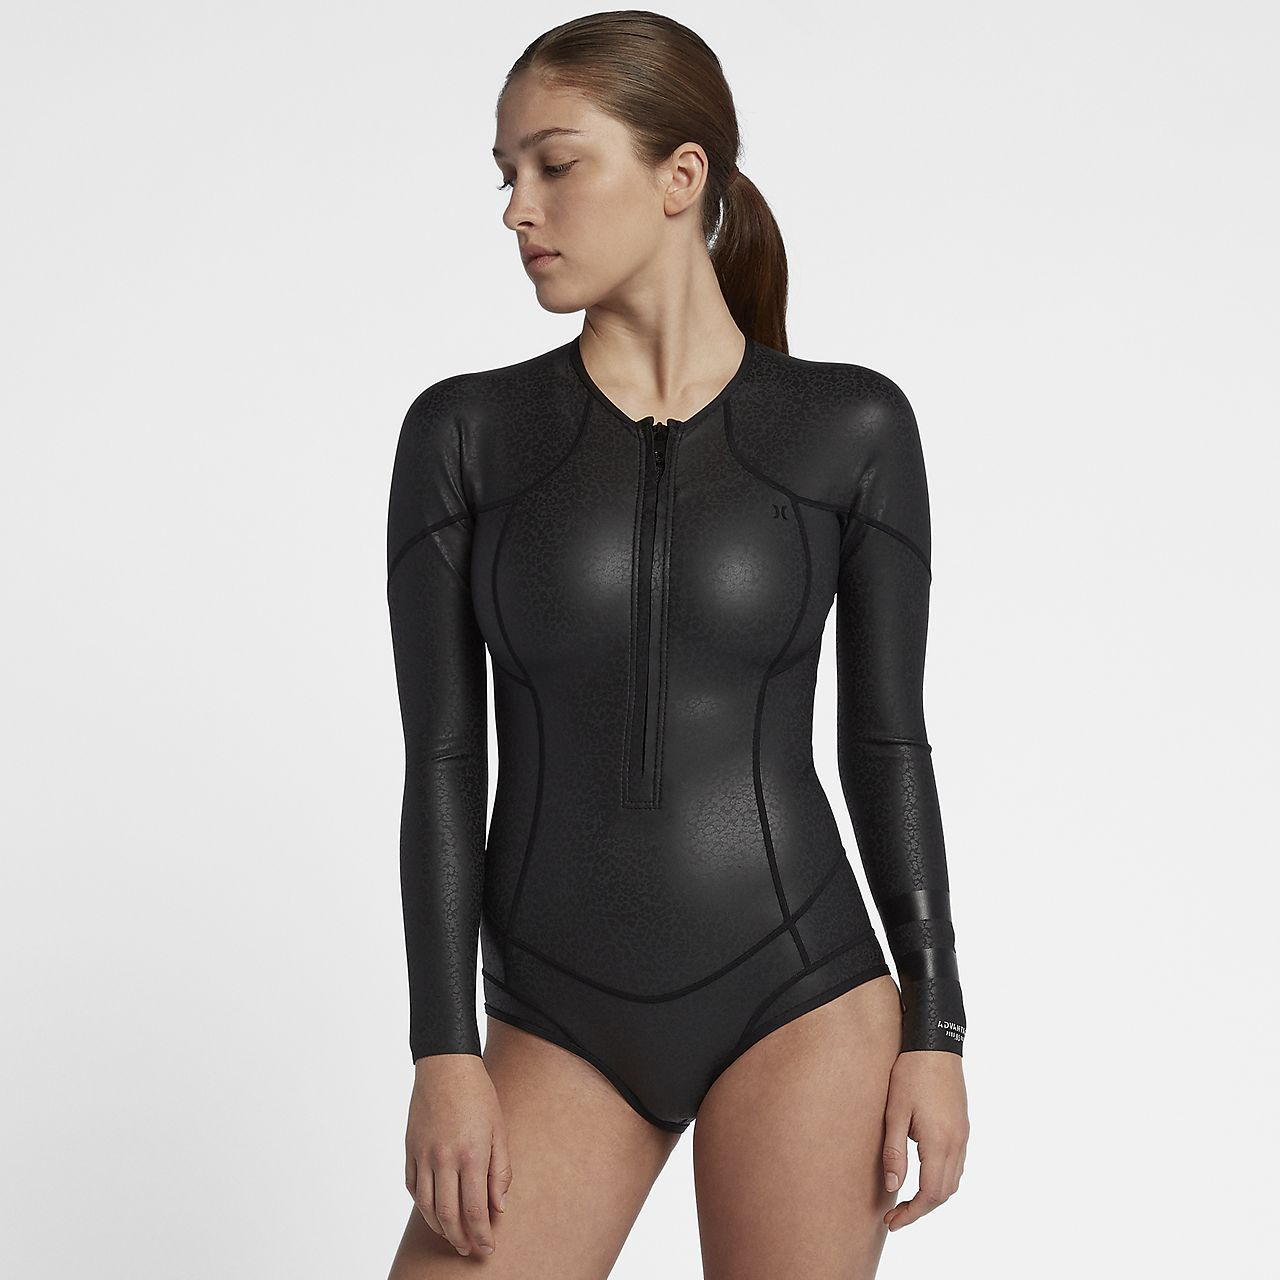 Hurley Advantage Plus 0.5mm Windskin Springsuit Women's Wetsuit